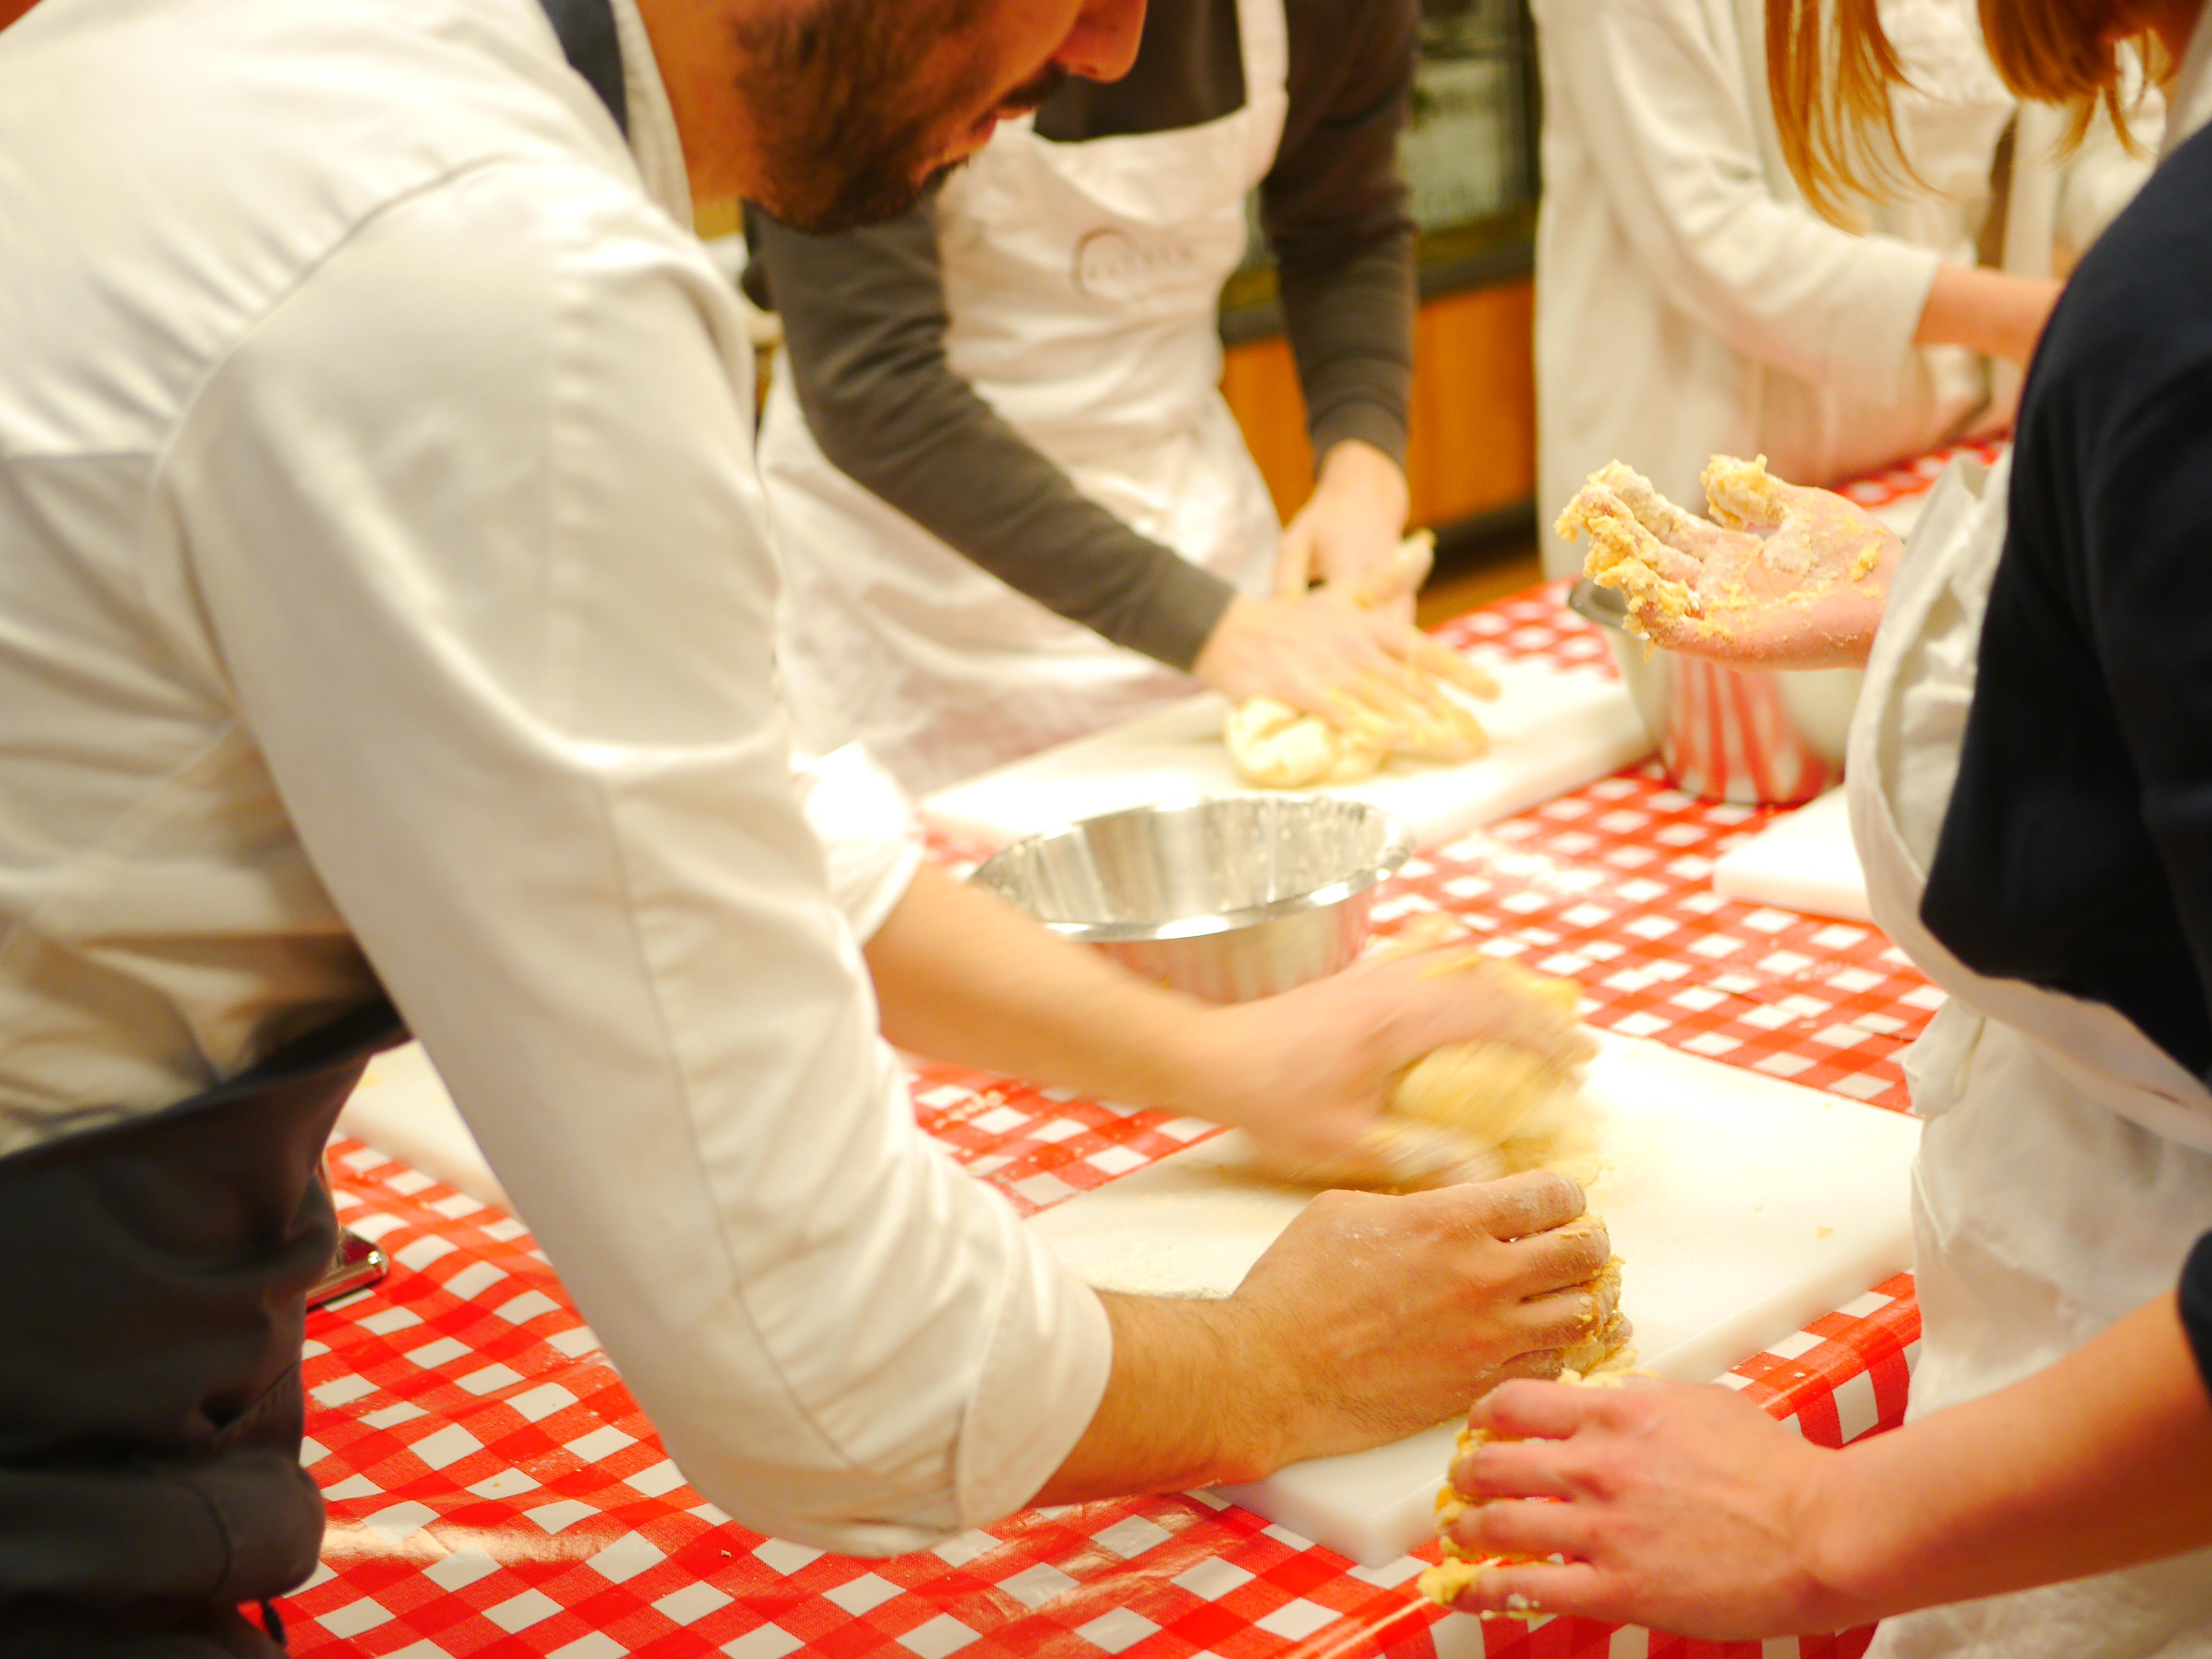 THE BEST OF ITALY | Grana Padano Käse im Fokus und handgemacht Spaghetti